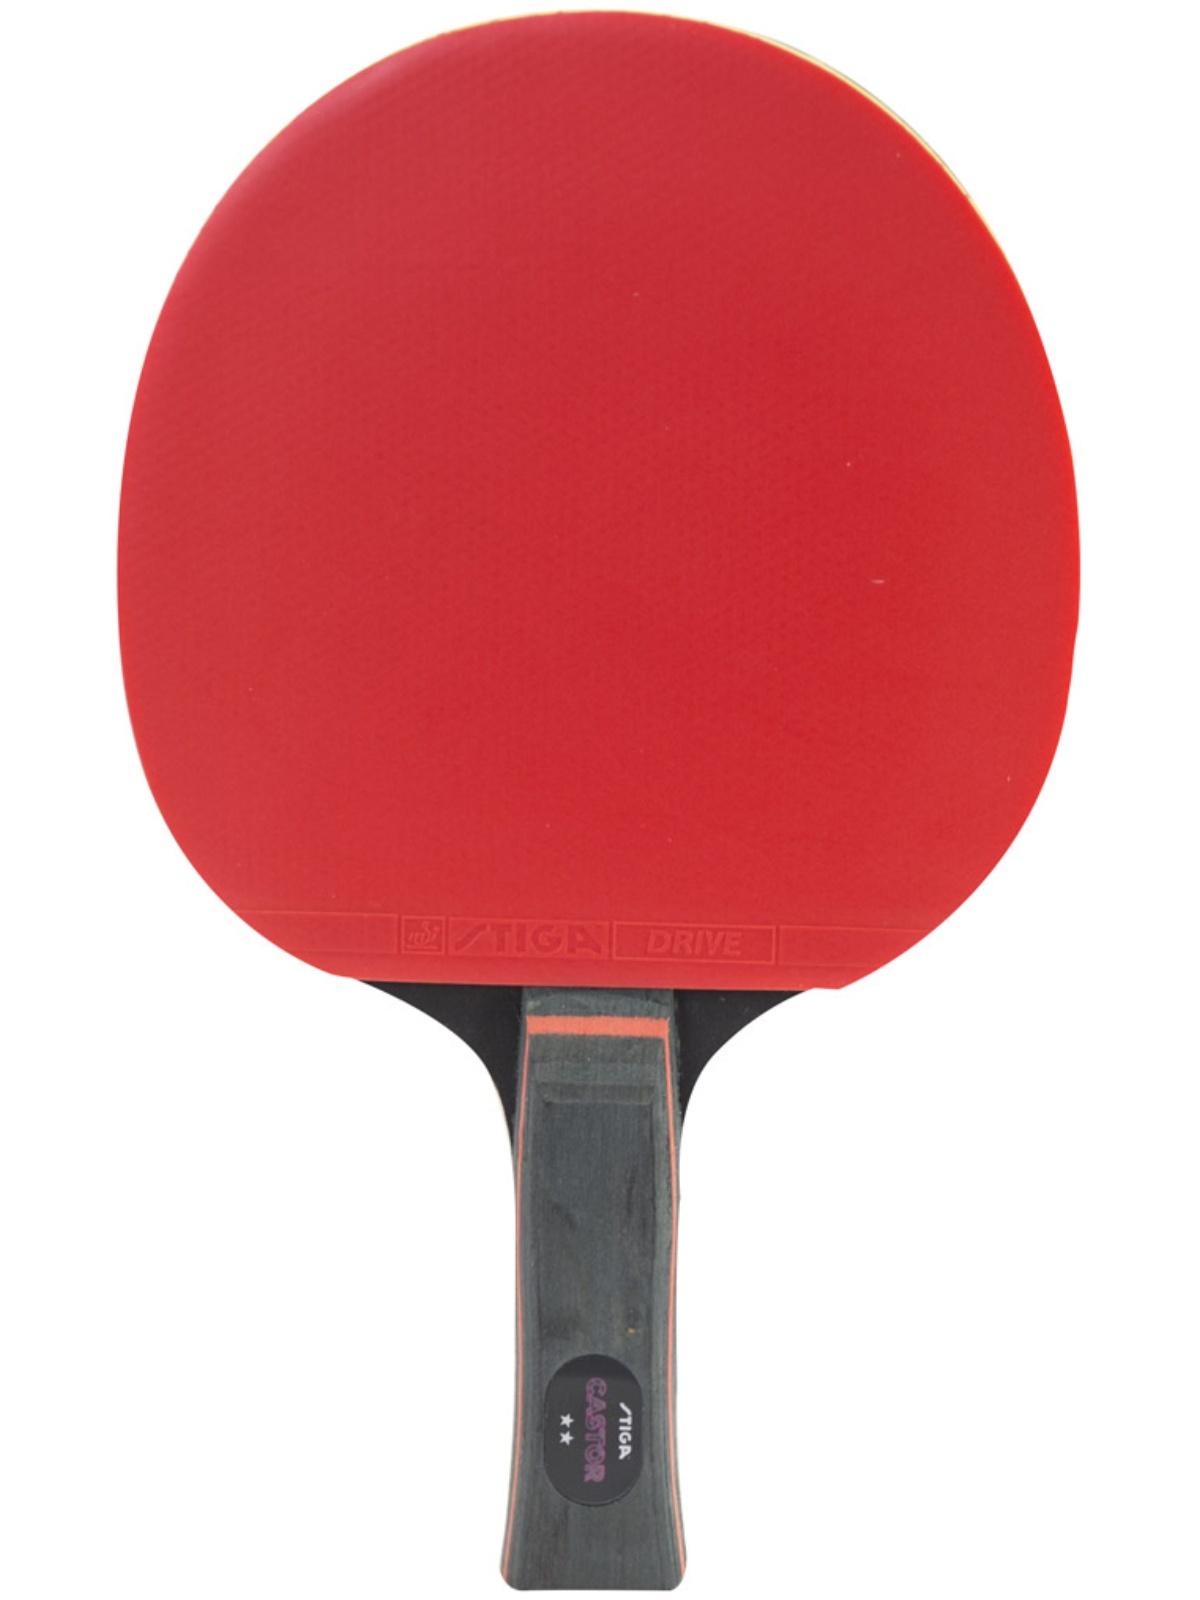 Raketa na stolný tenis STIGA Castor